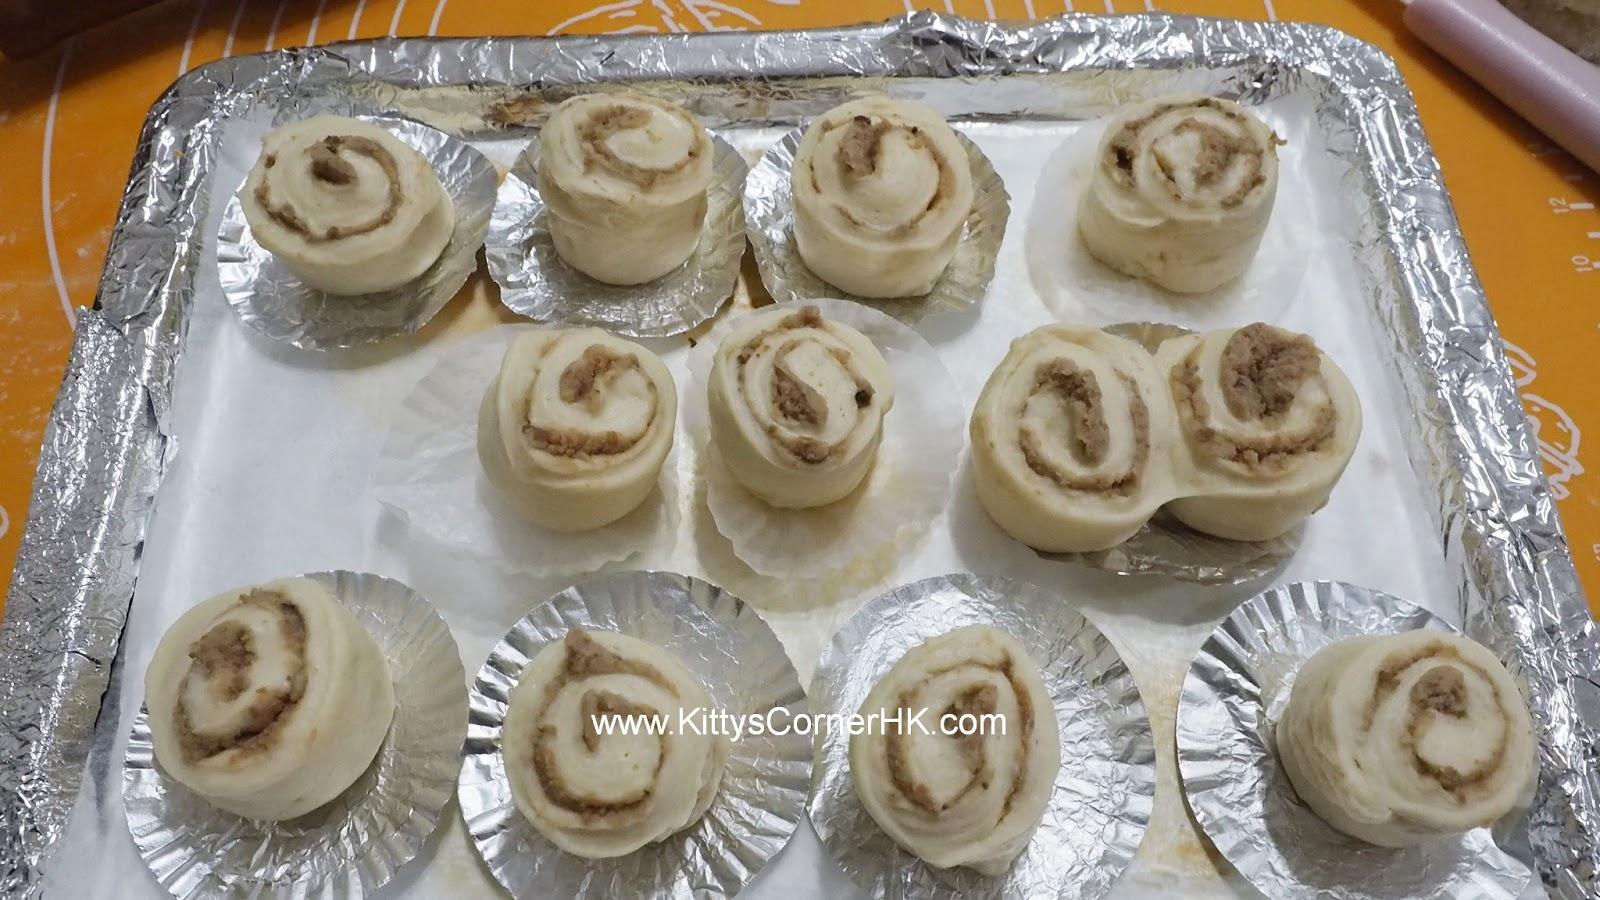 Chestnut Roll DIY recipe 栗子卷 自家烘焙食譜